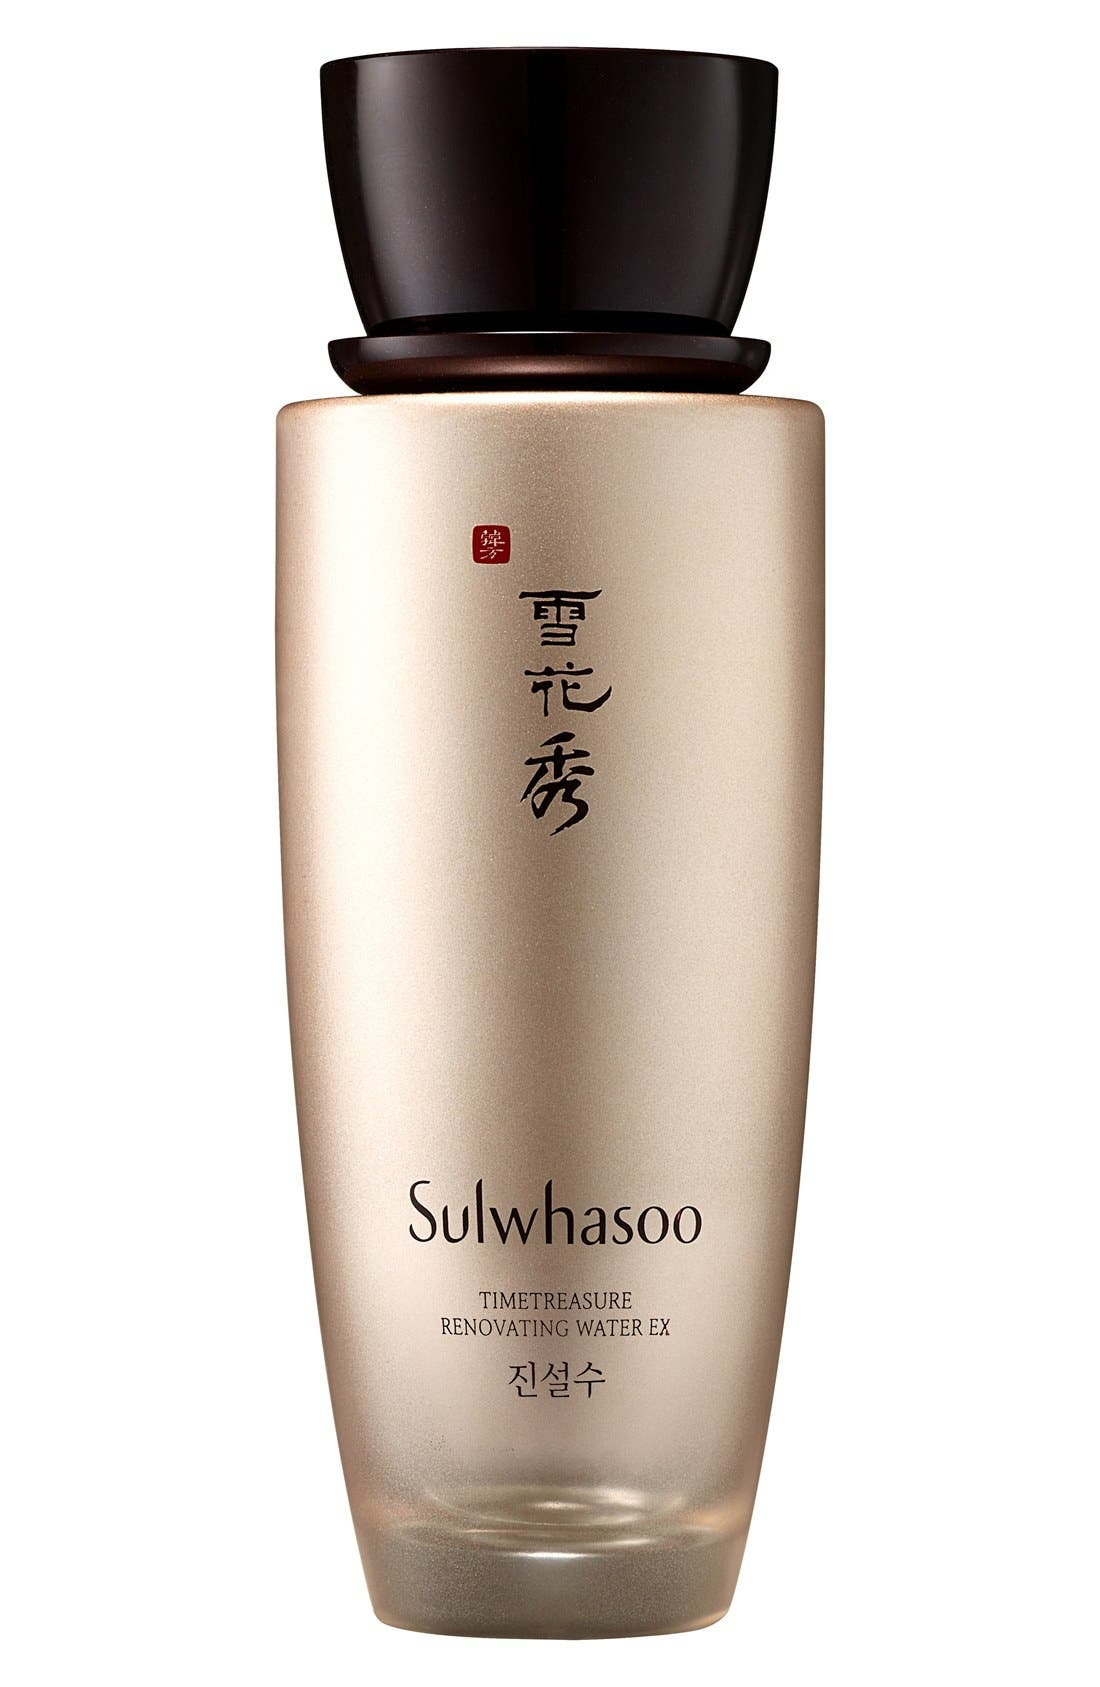 Sulwhasoo 'Timetreasure' Renovating Water EX